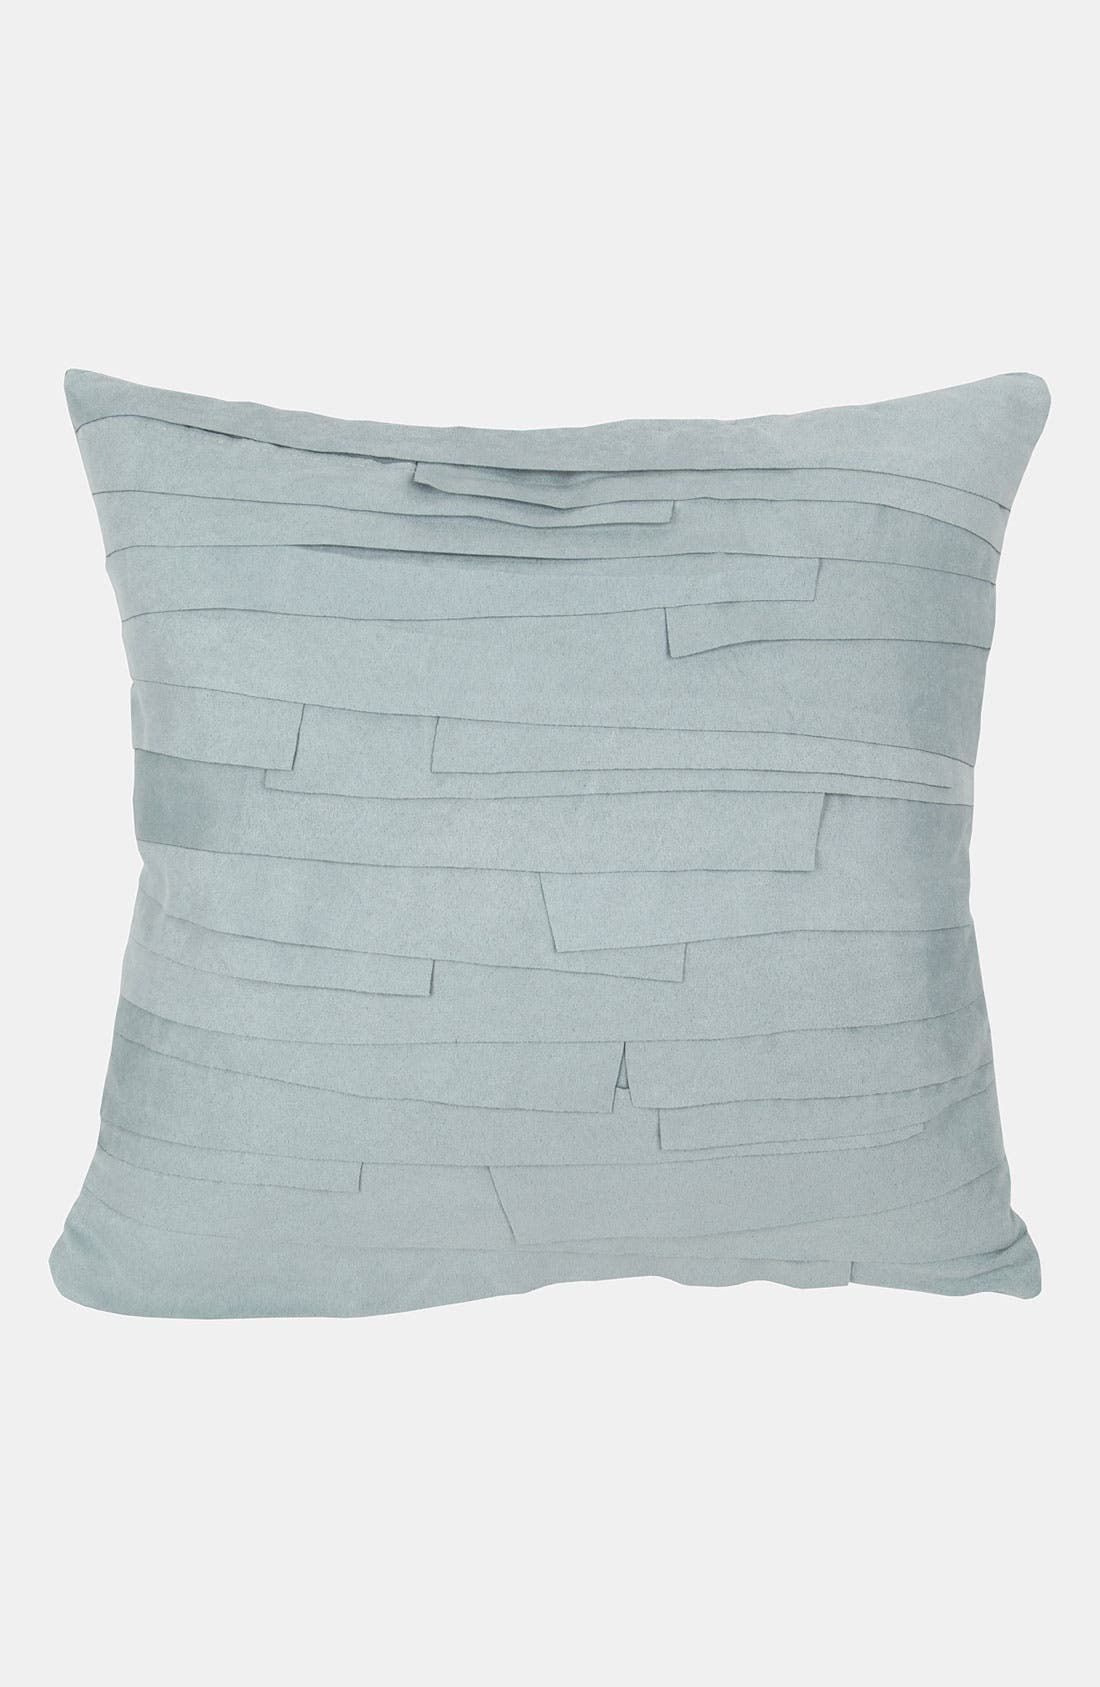 Alternate Image 1 Selected - Blissliving Home 'Yves' Pillow (Online Only)